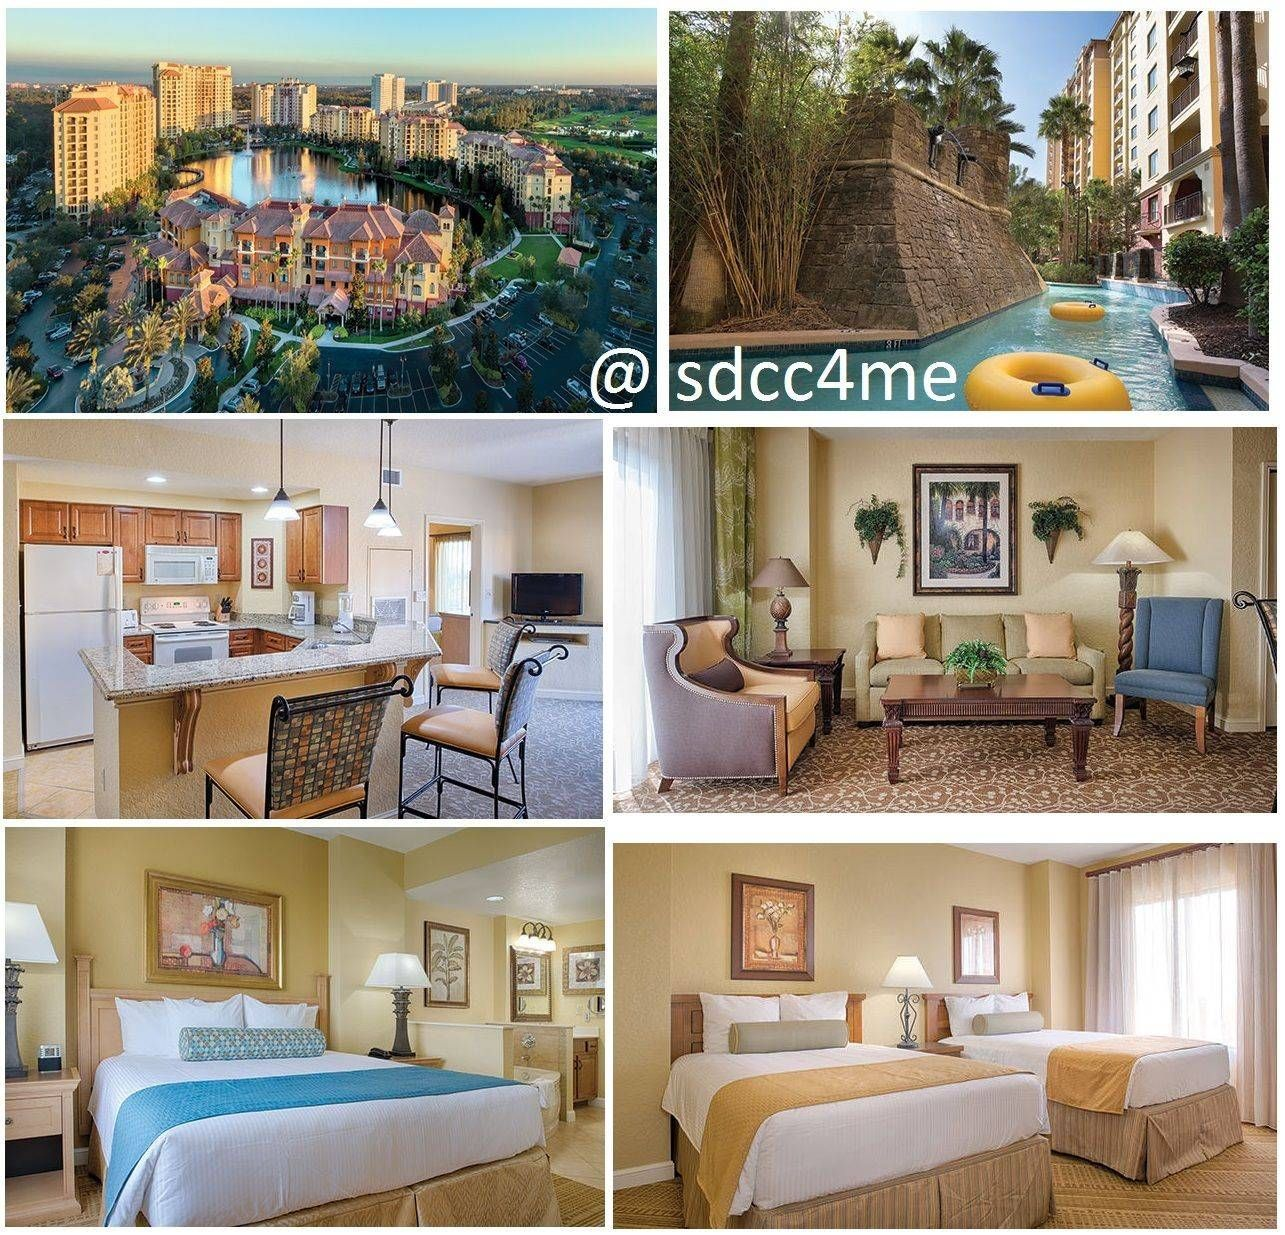 Awesome Wyndham Bonnet Creek Resort 2br Dlx September 26 29 Disney World Orlando Resort Orlando Resorts Wyndham Bonnet Creek Bonnet Creek